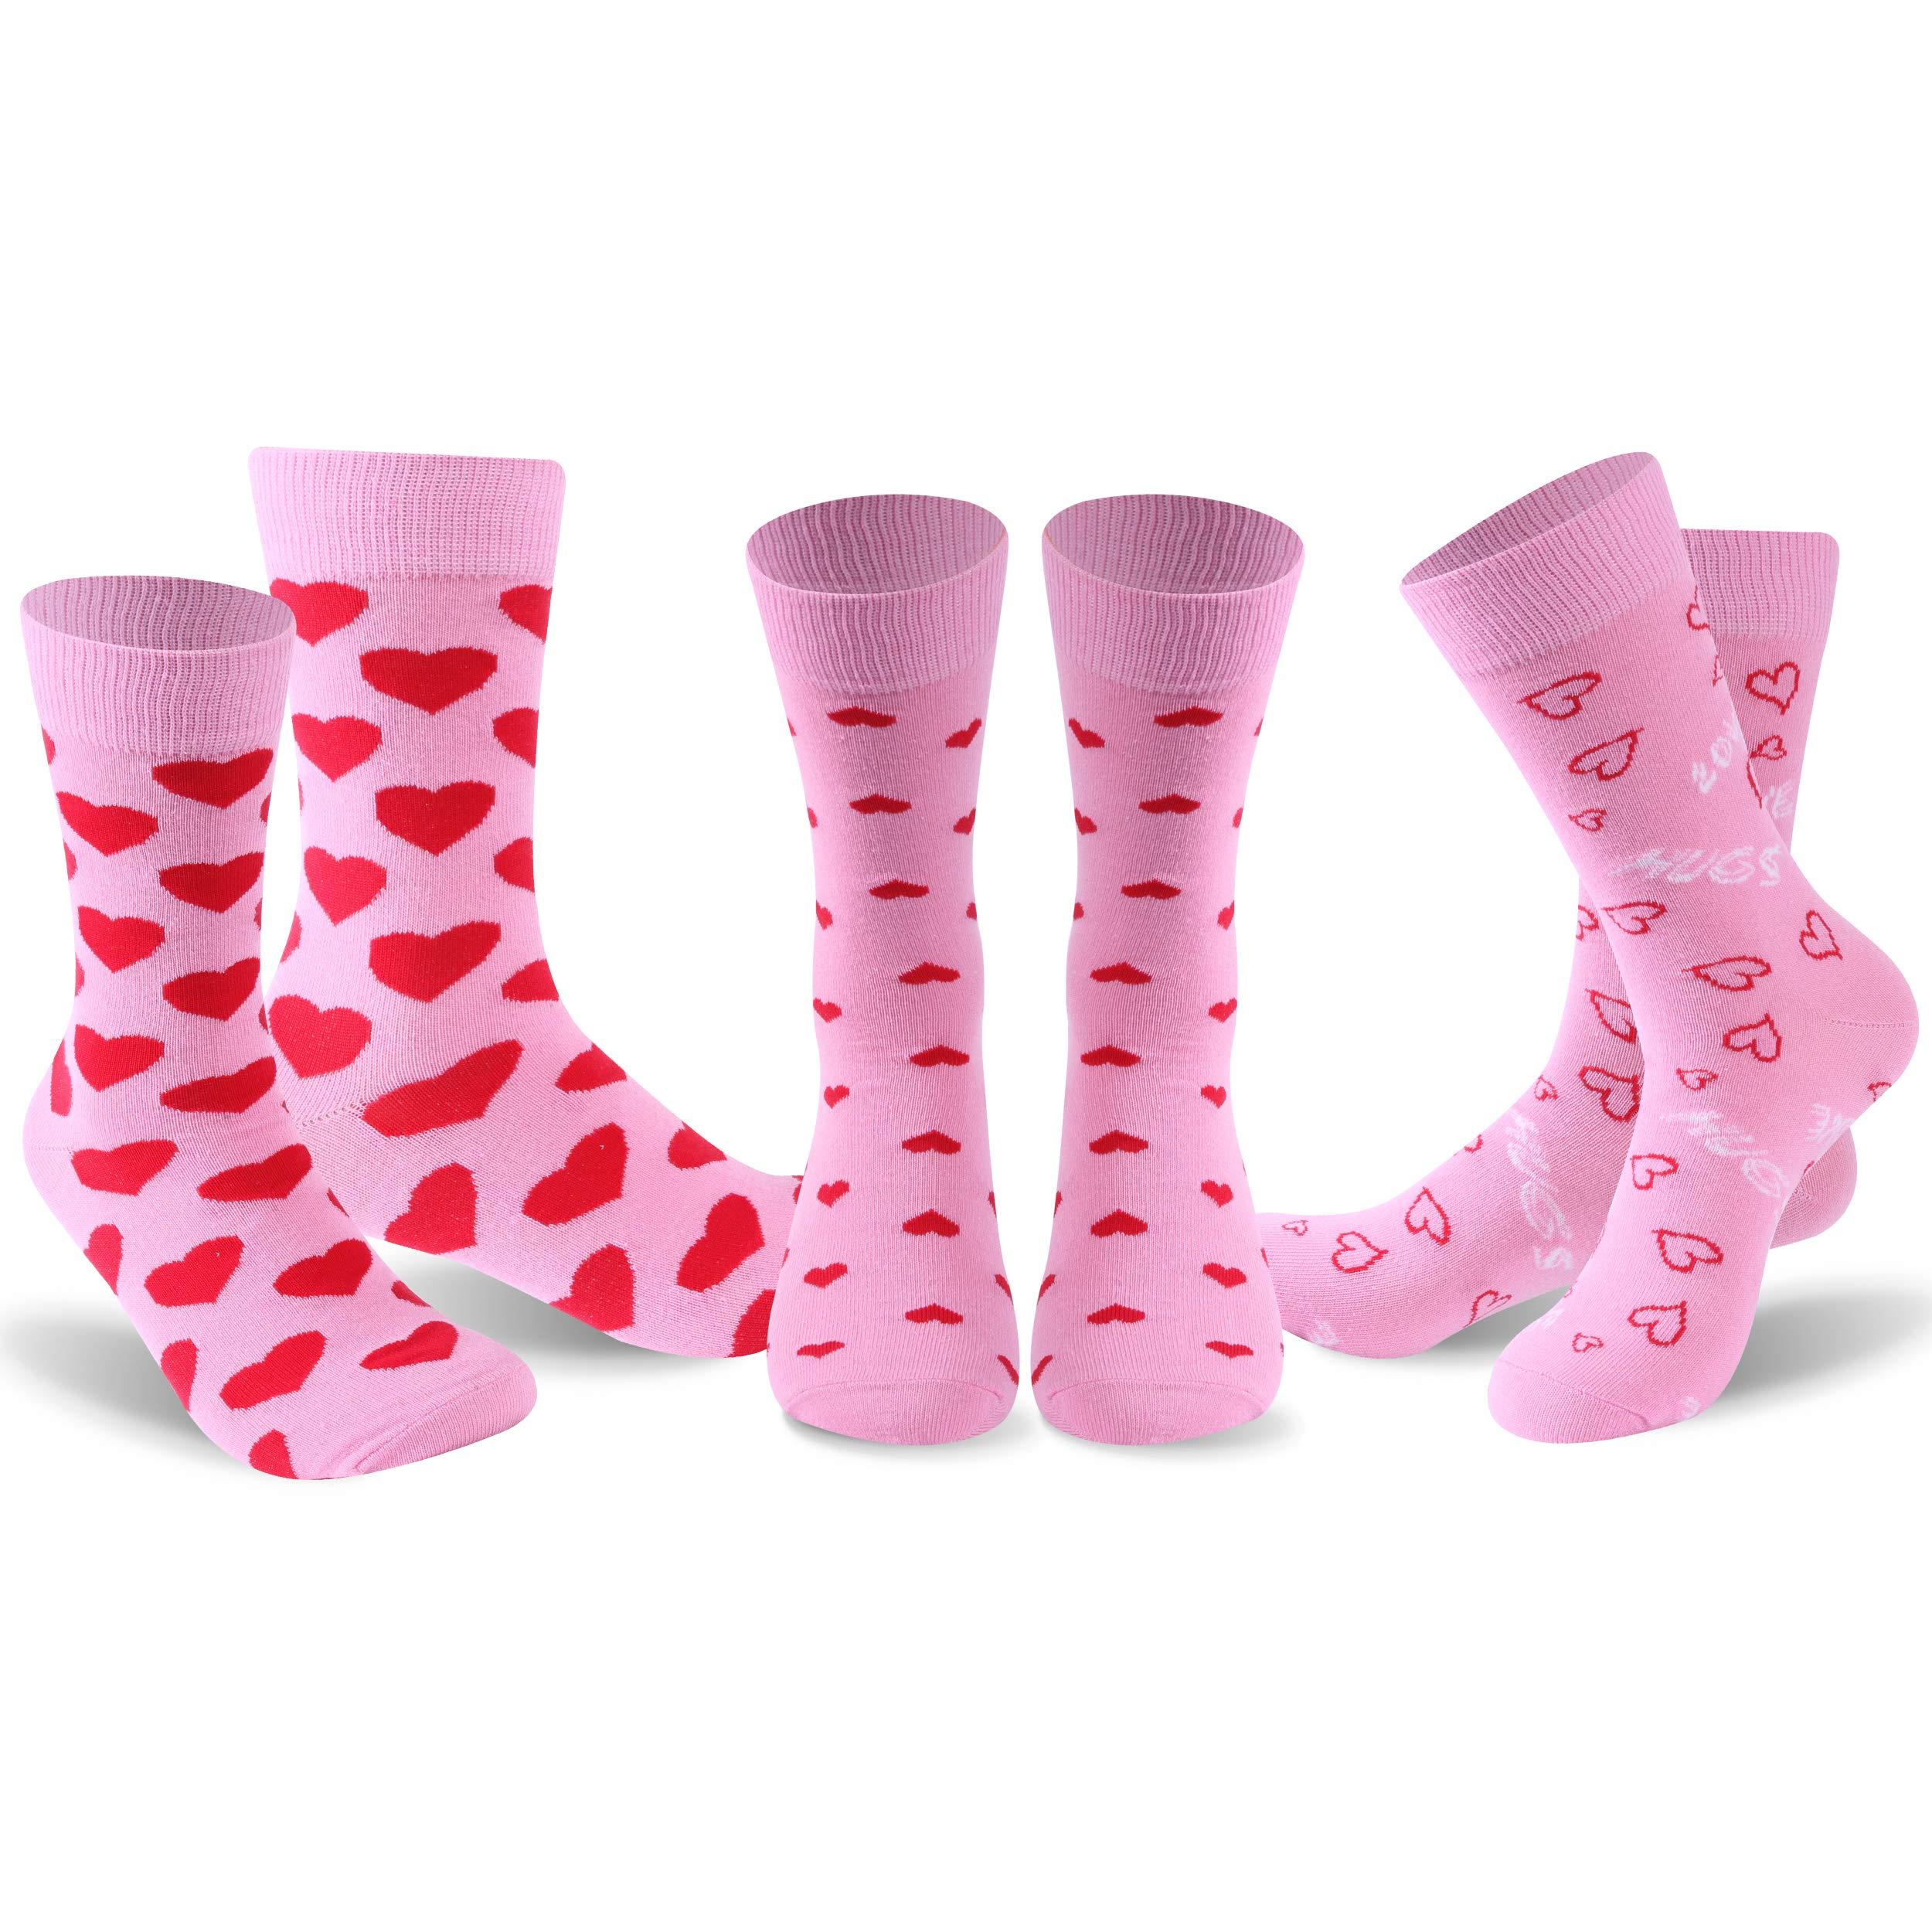 Heart Printed Novelty Socks, FOOTPLUS Womens Cotton Love Anniversary Gift Crew Dress Socks